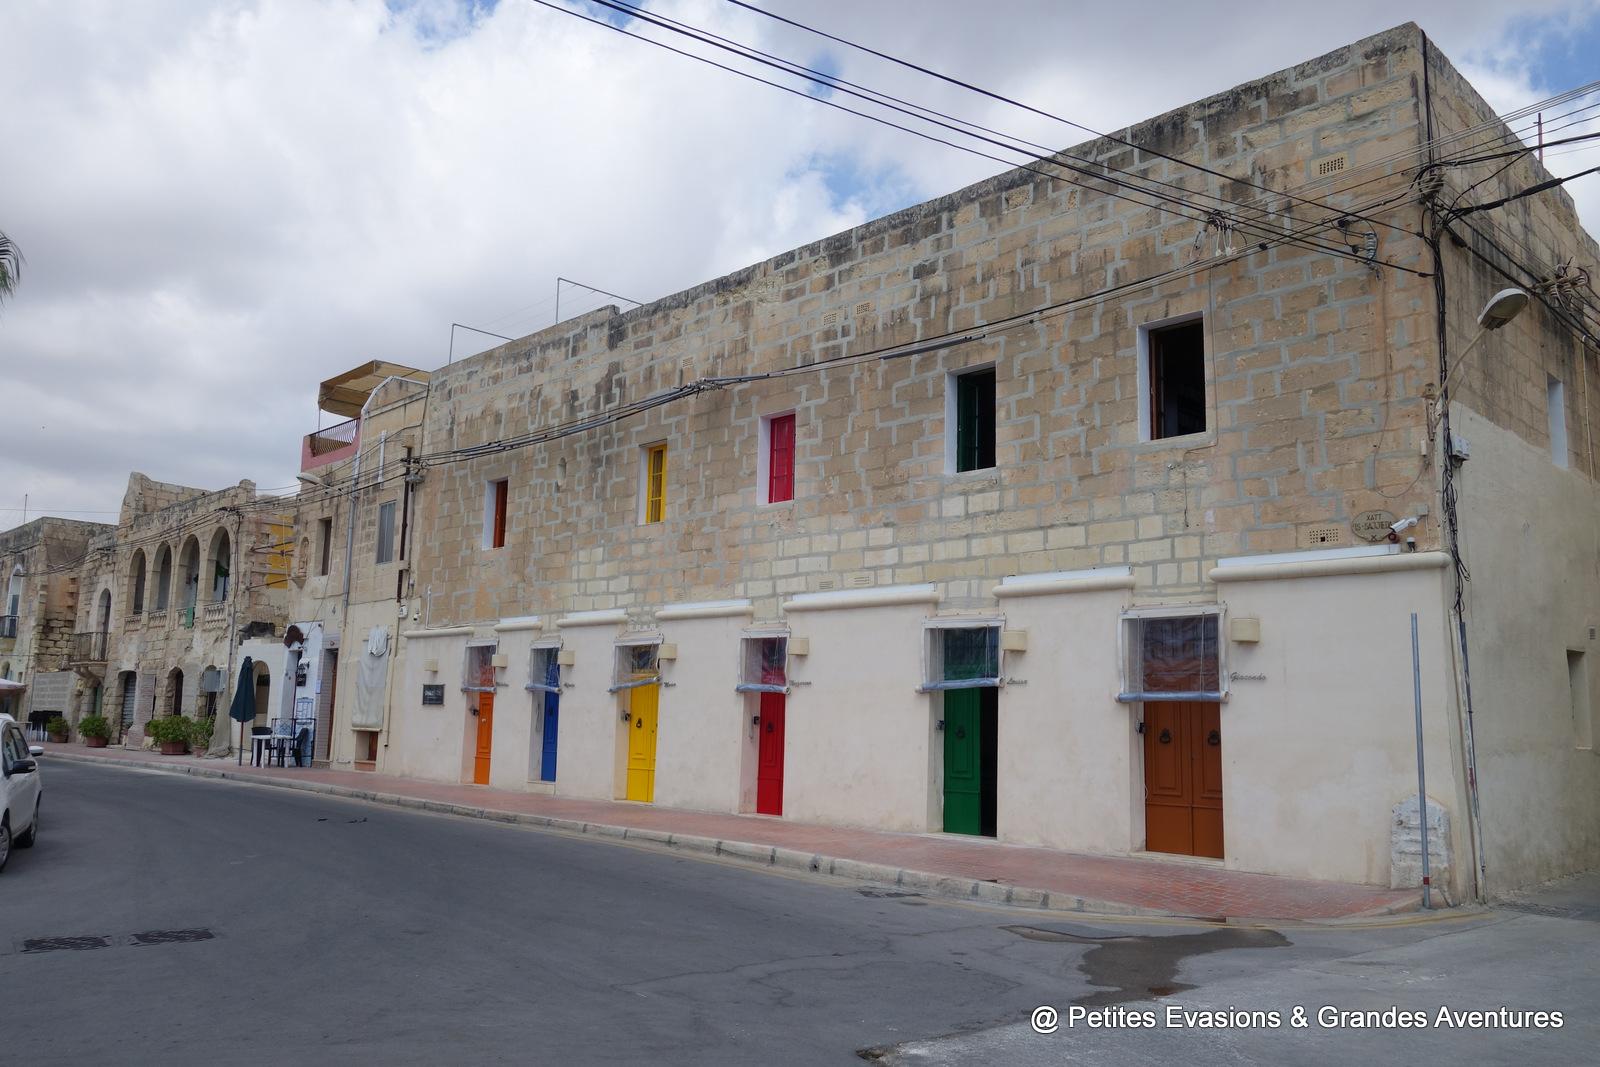 Portes multicolores à Marsaxlokk (Malte)